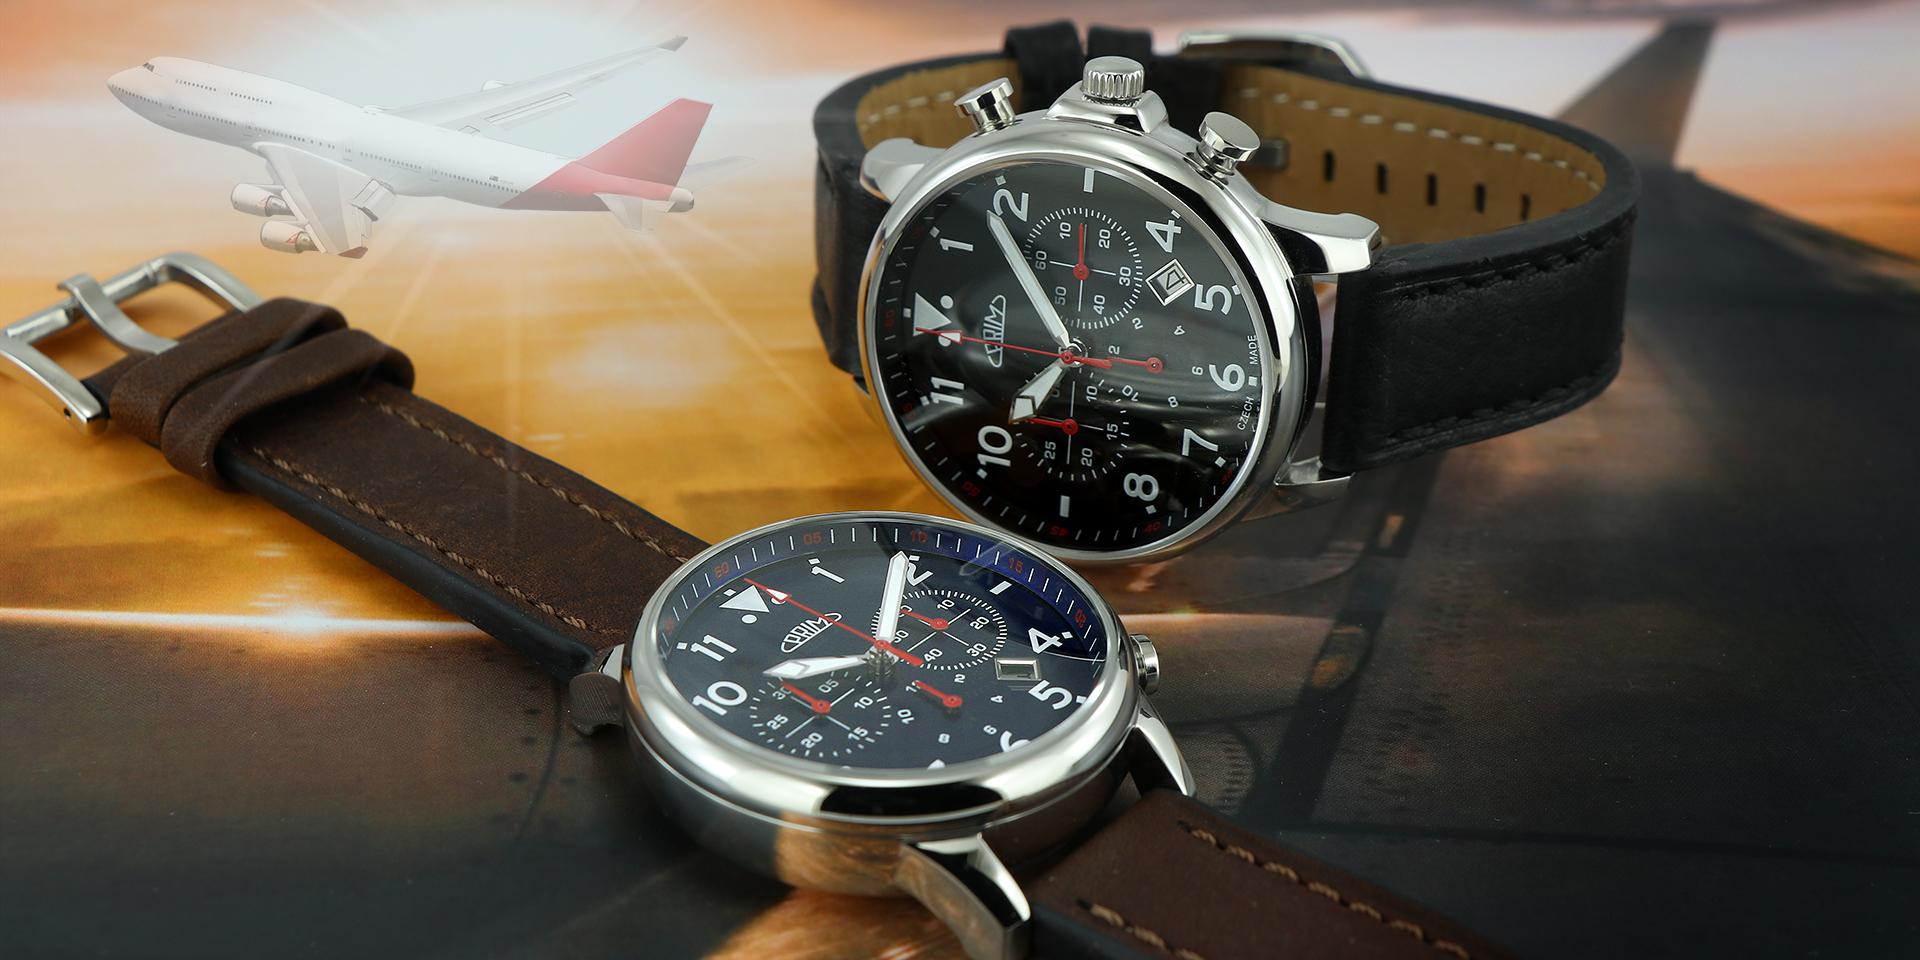 PILOT-CHRONO-AUTOMATIC_banner-3-1920x960.jpg